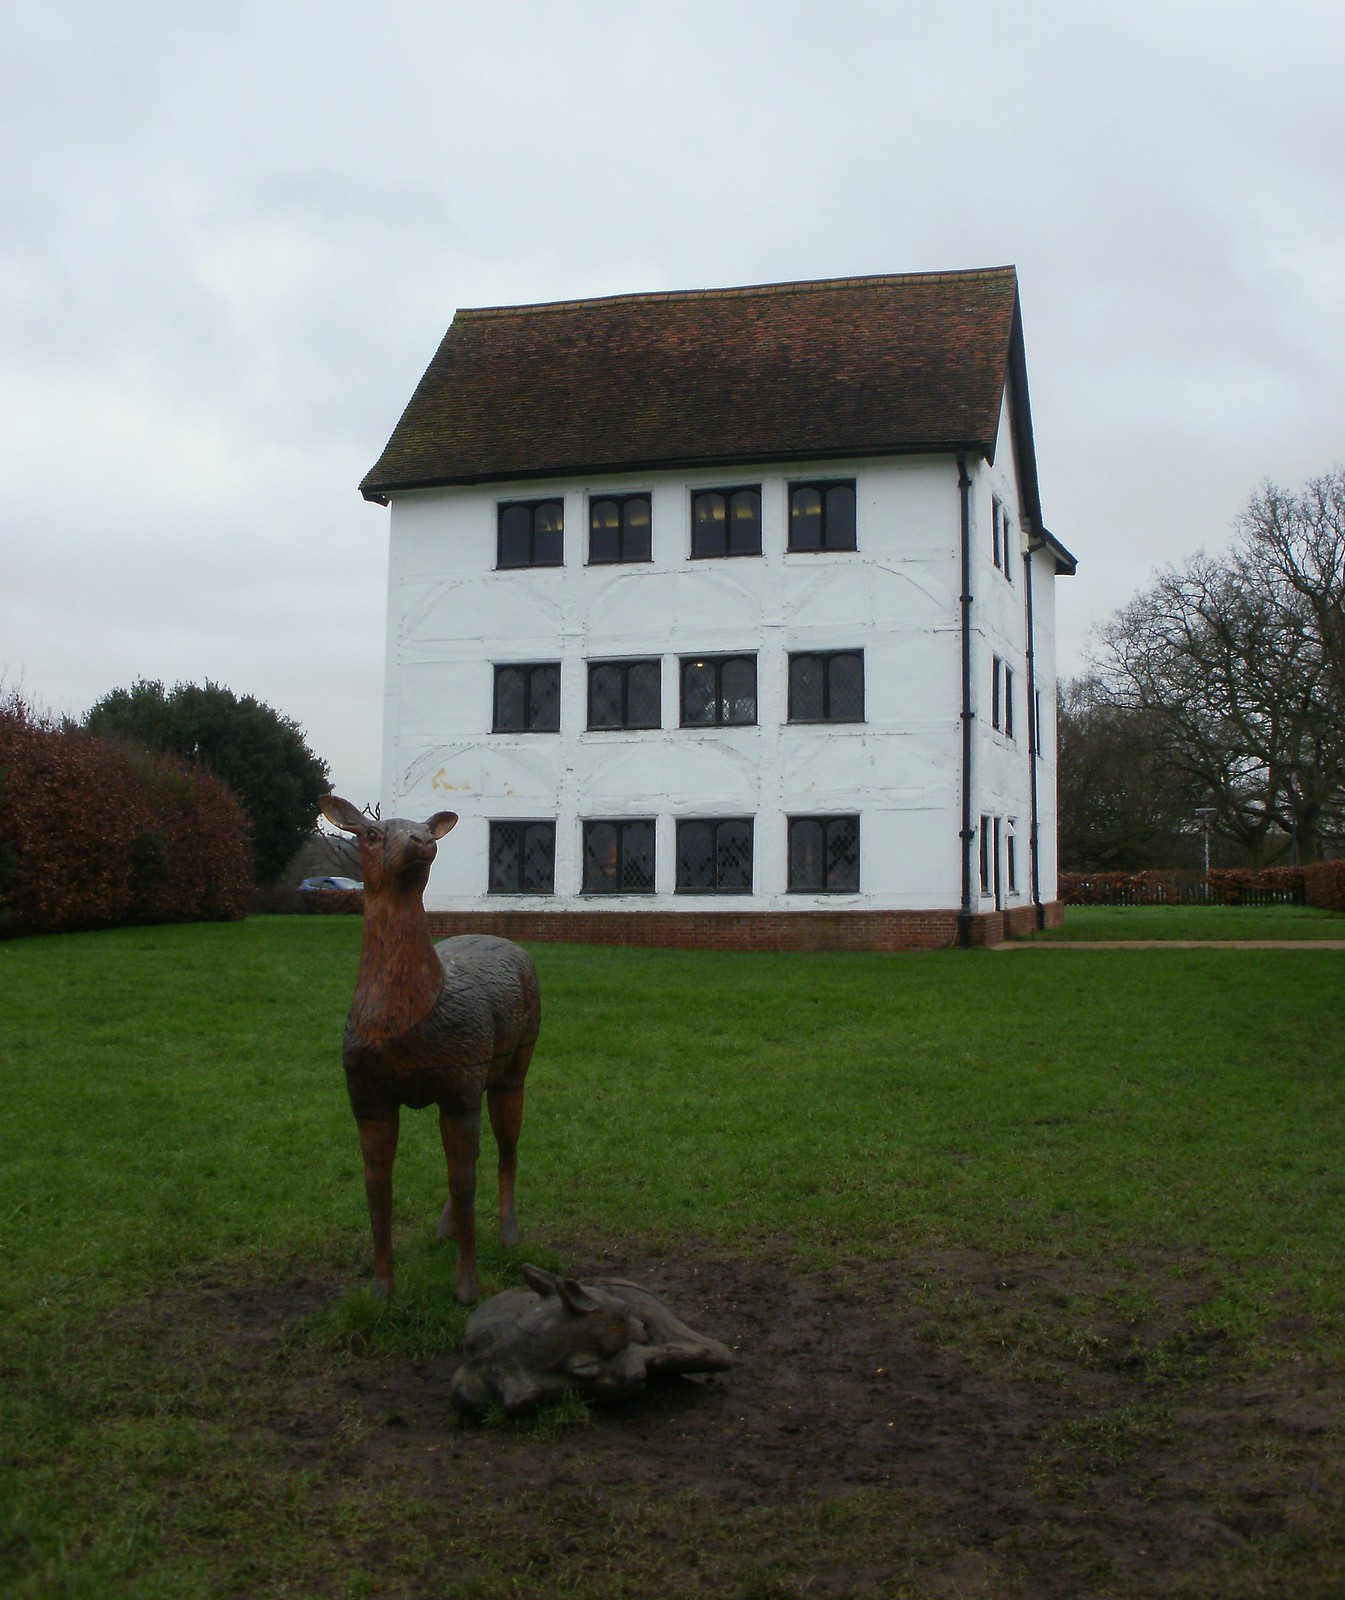 Elizabeth I lodge and deer statues Chingford OLYMPUS DIGITAL CAMERA